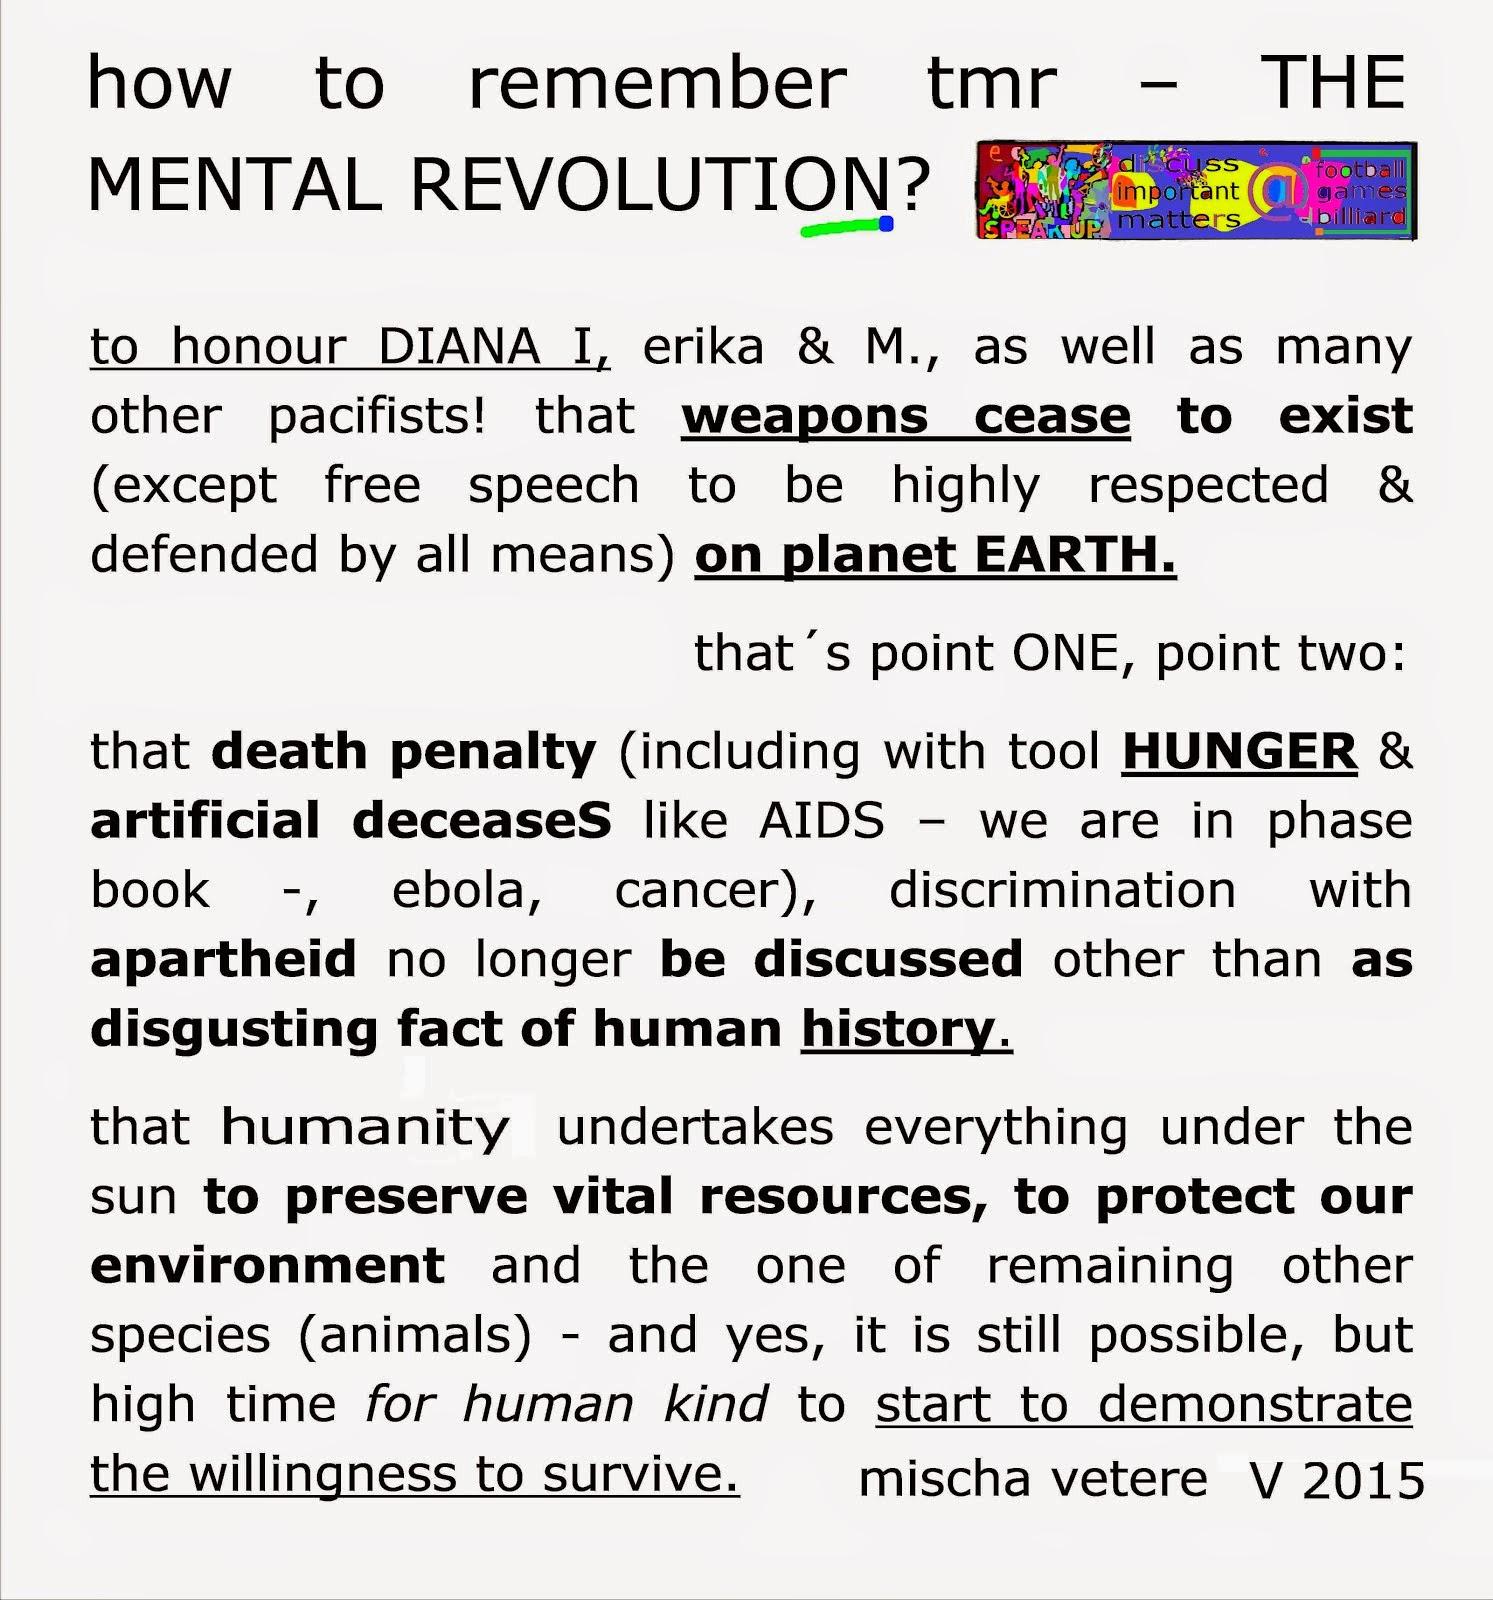 HOPE humanity TMR THE MENTAL REVOLUTION mischa vetere princess diana princes of wales NOBEL barack